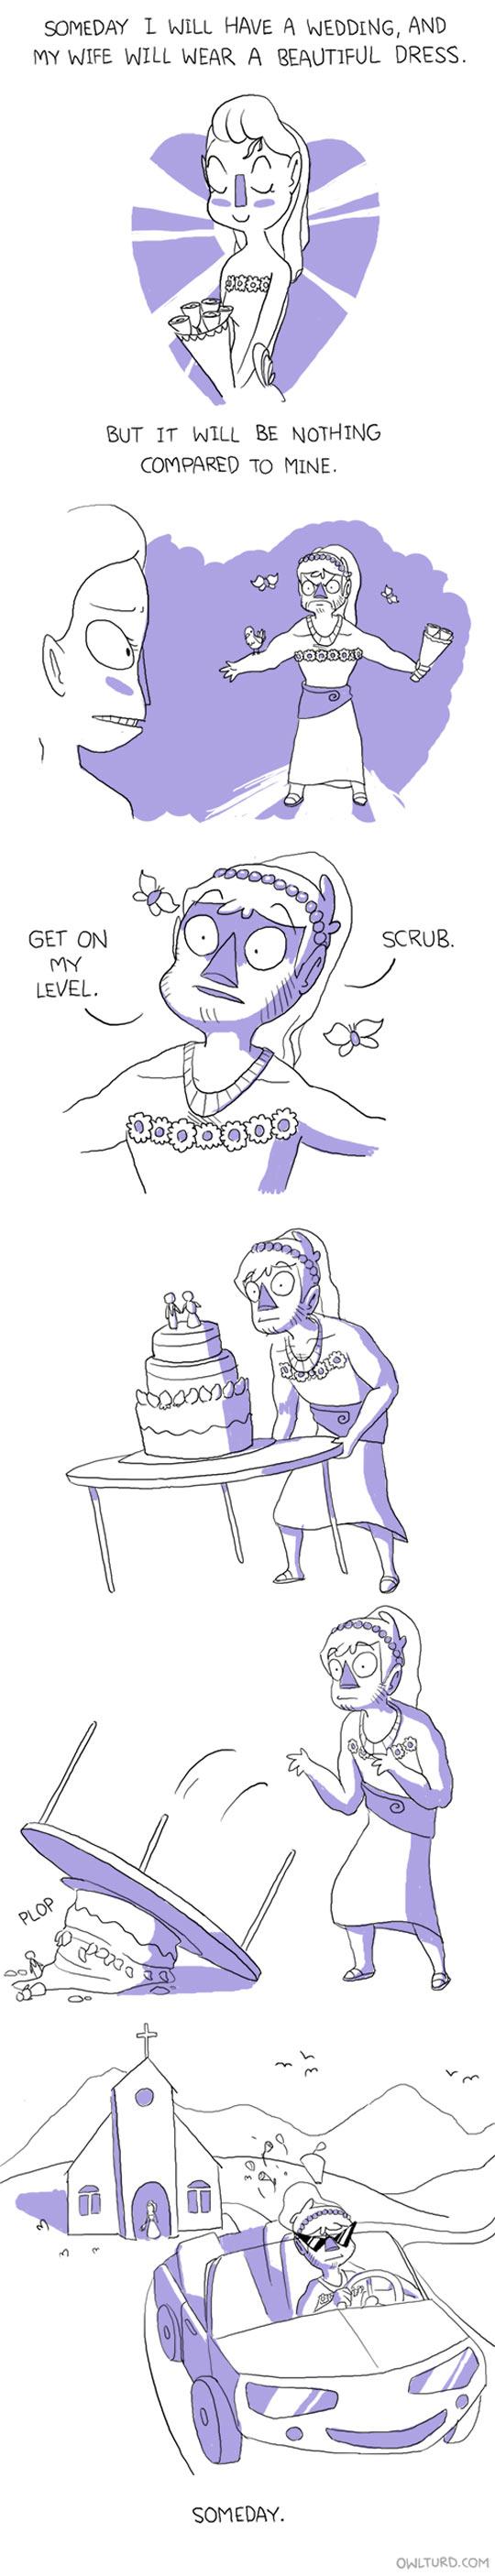 funny-girl-wedding-dress-comic